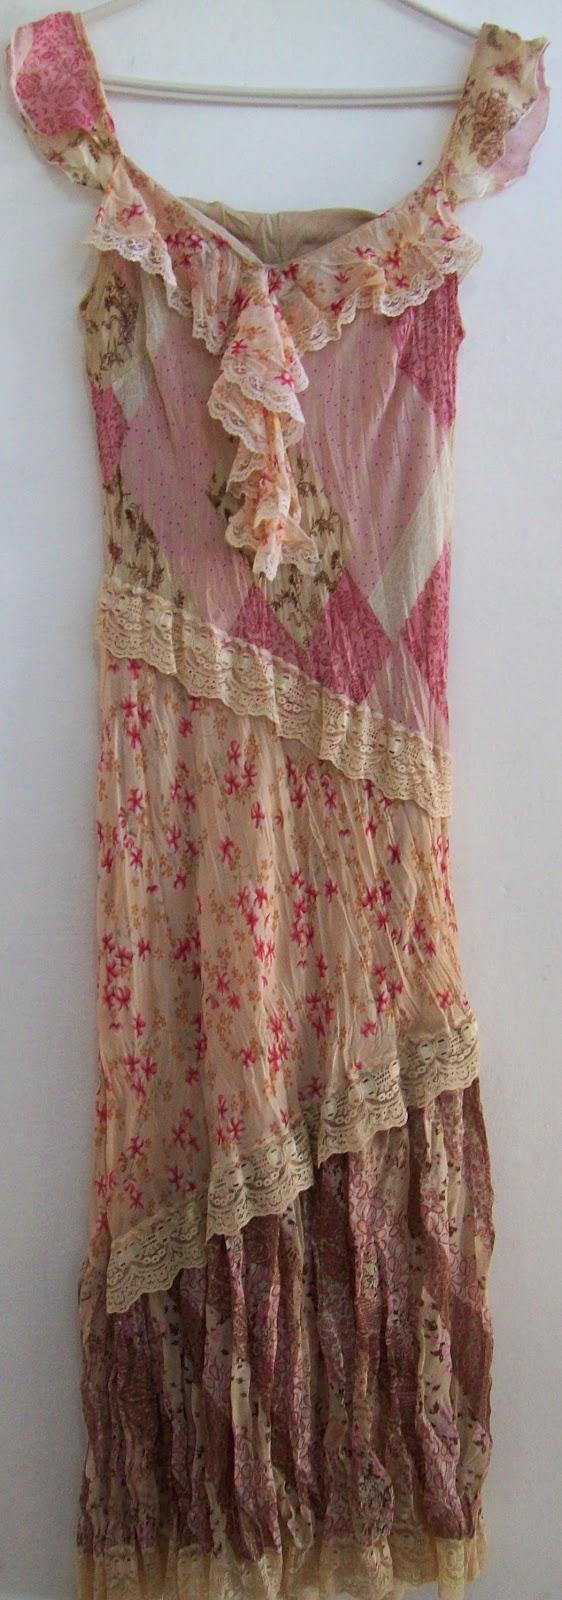 Vestido floral tamanho 40